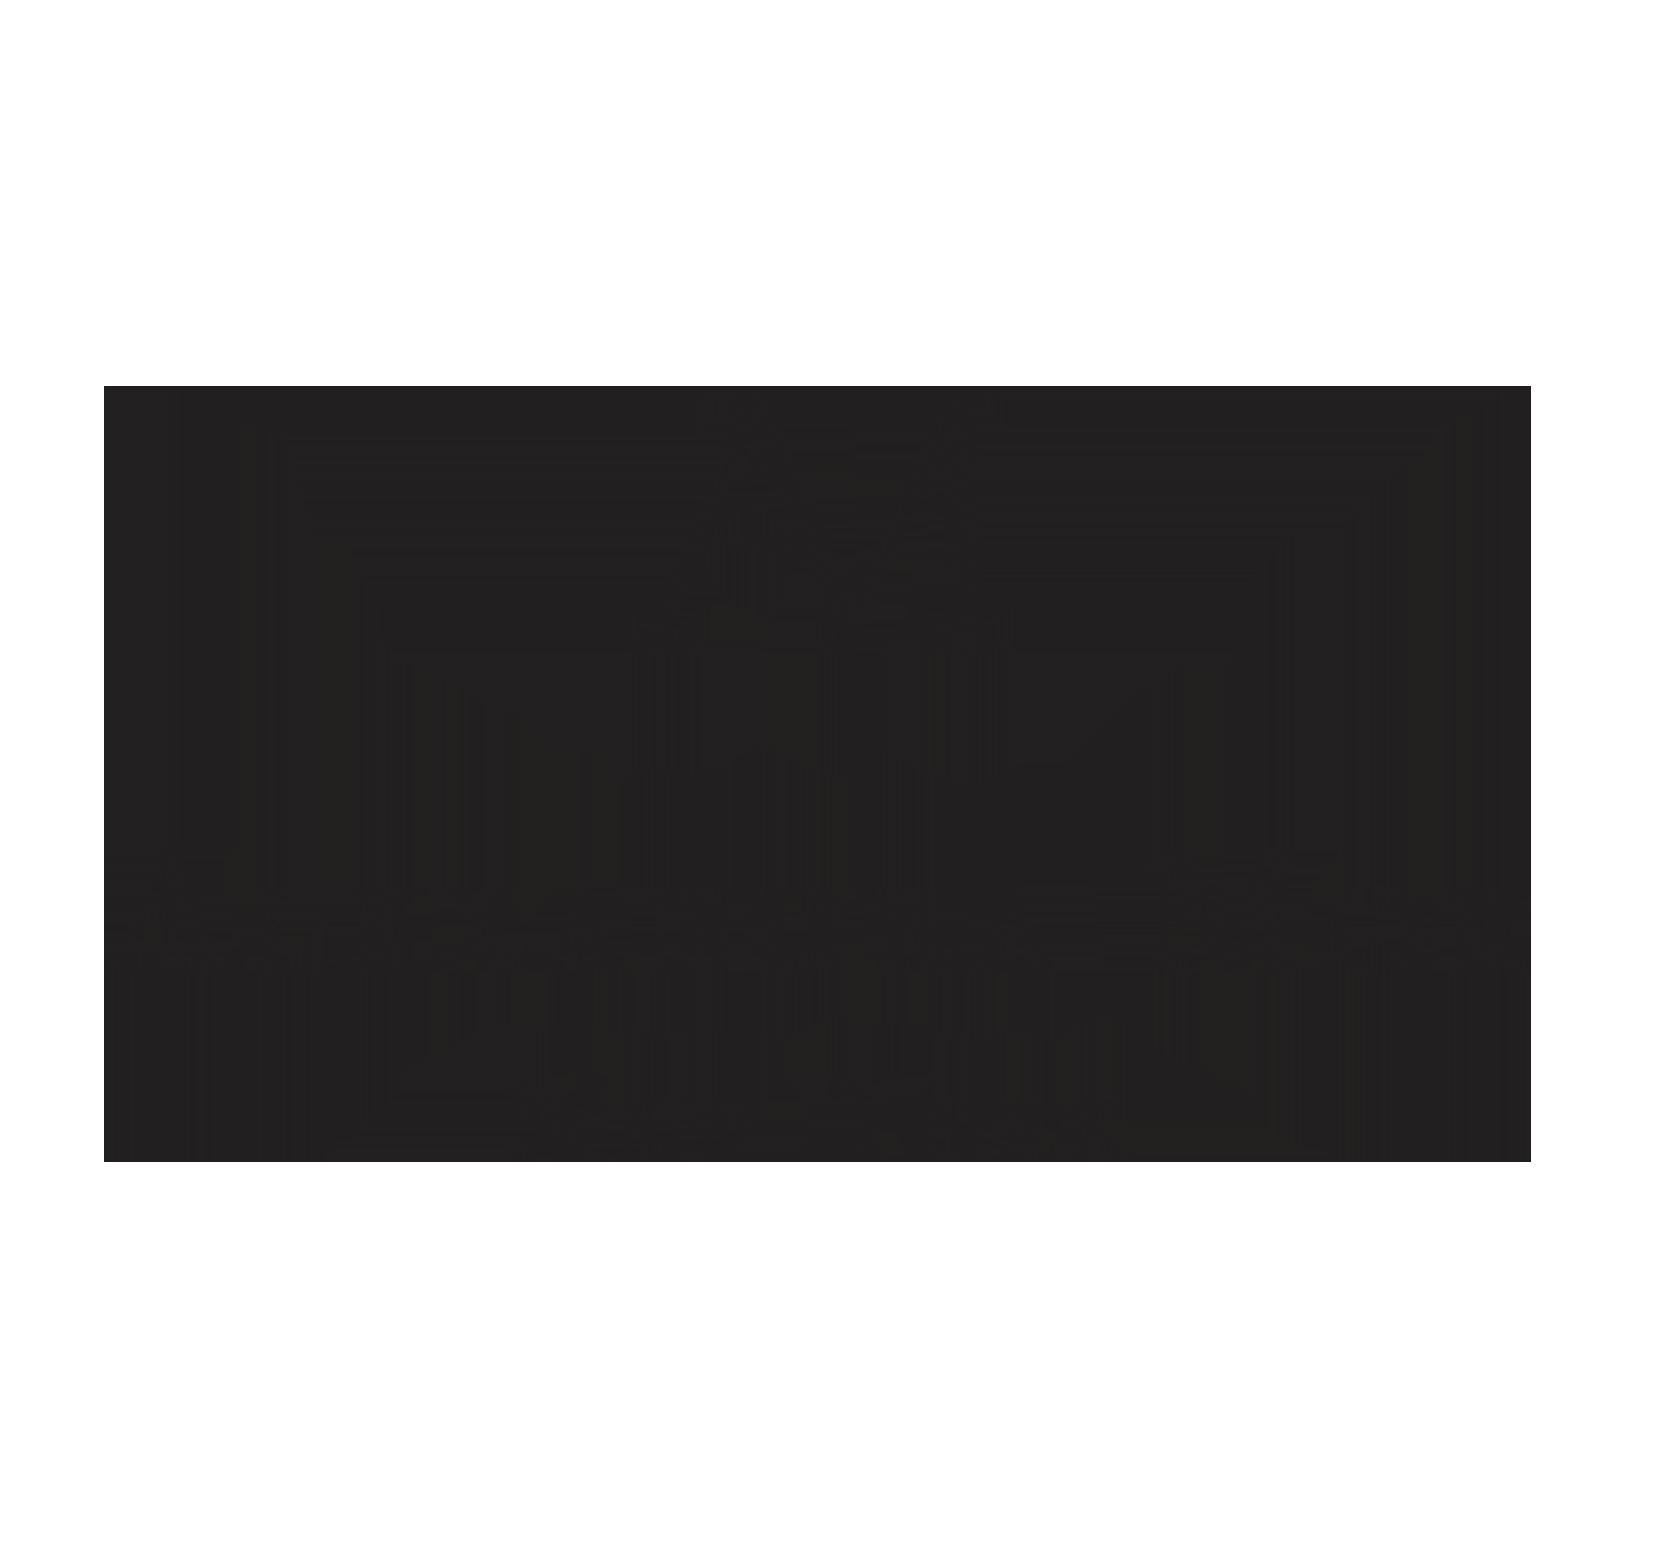 Alexandra Mor